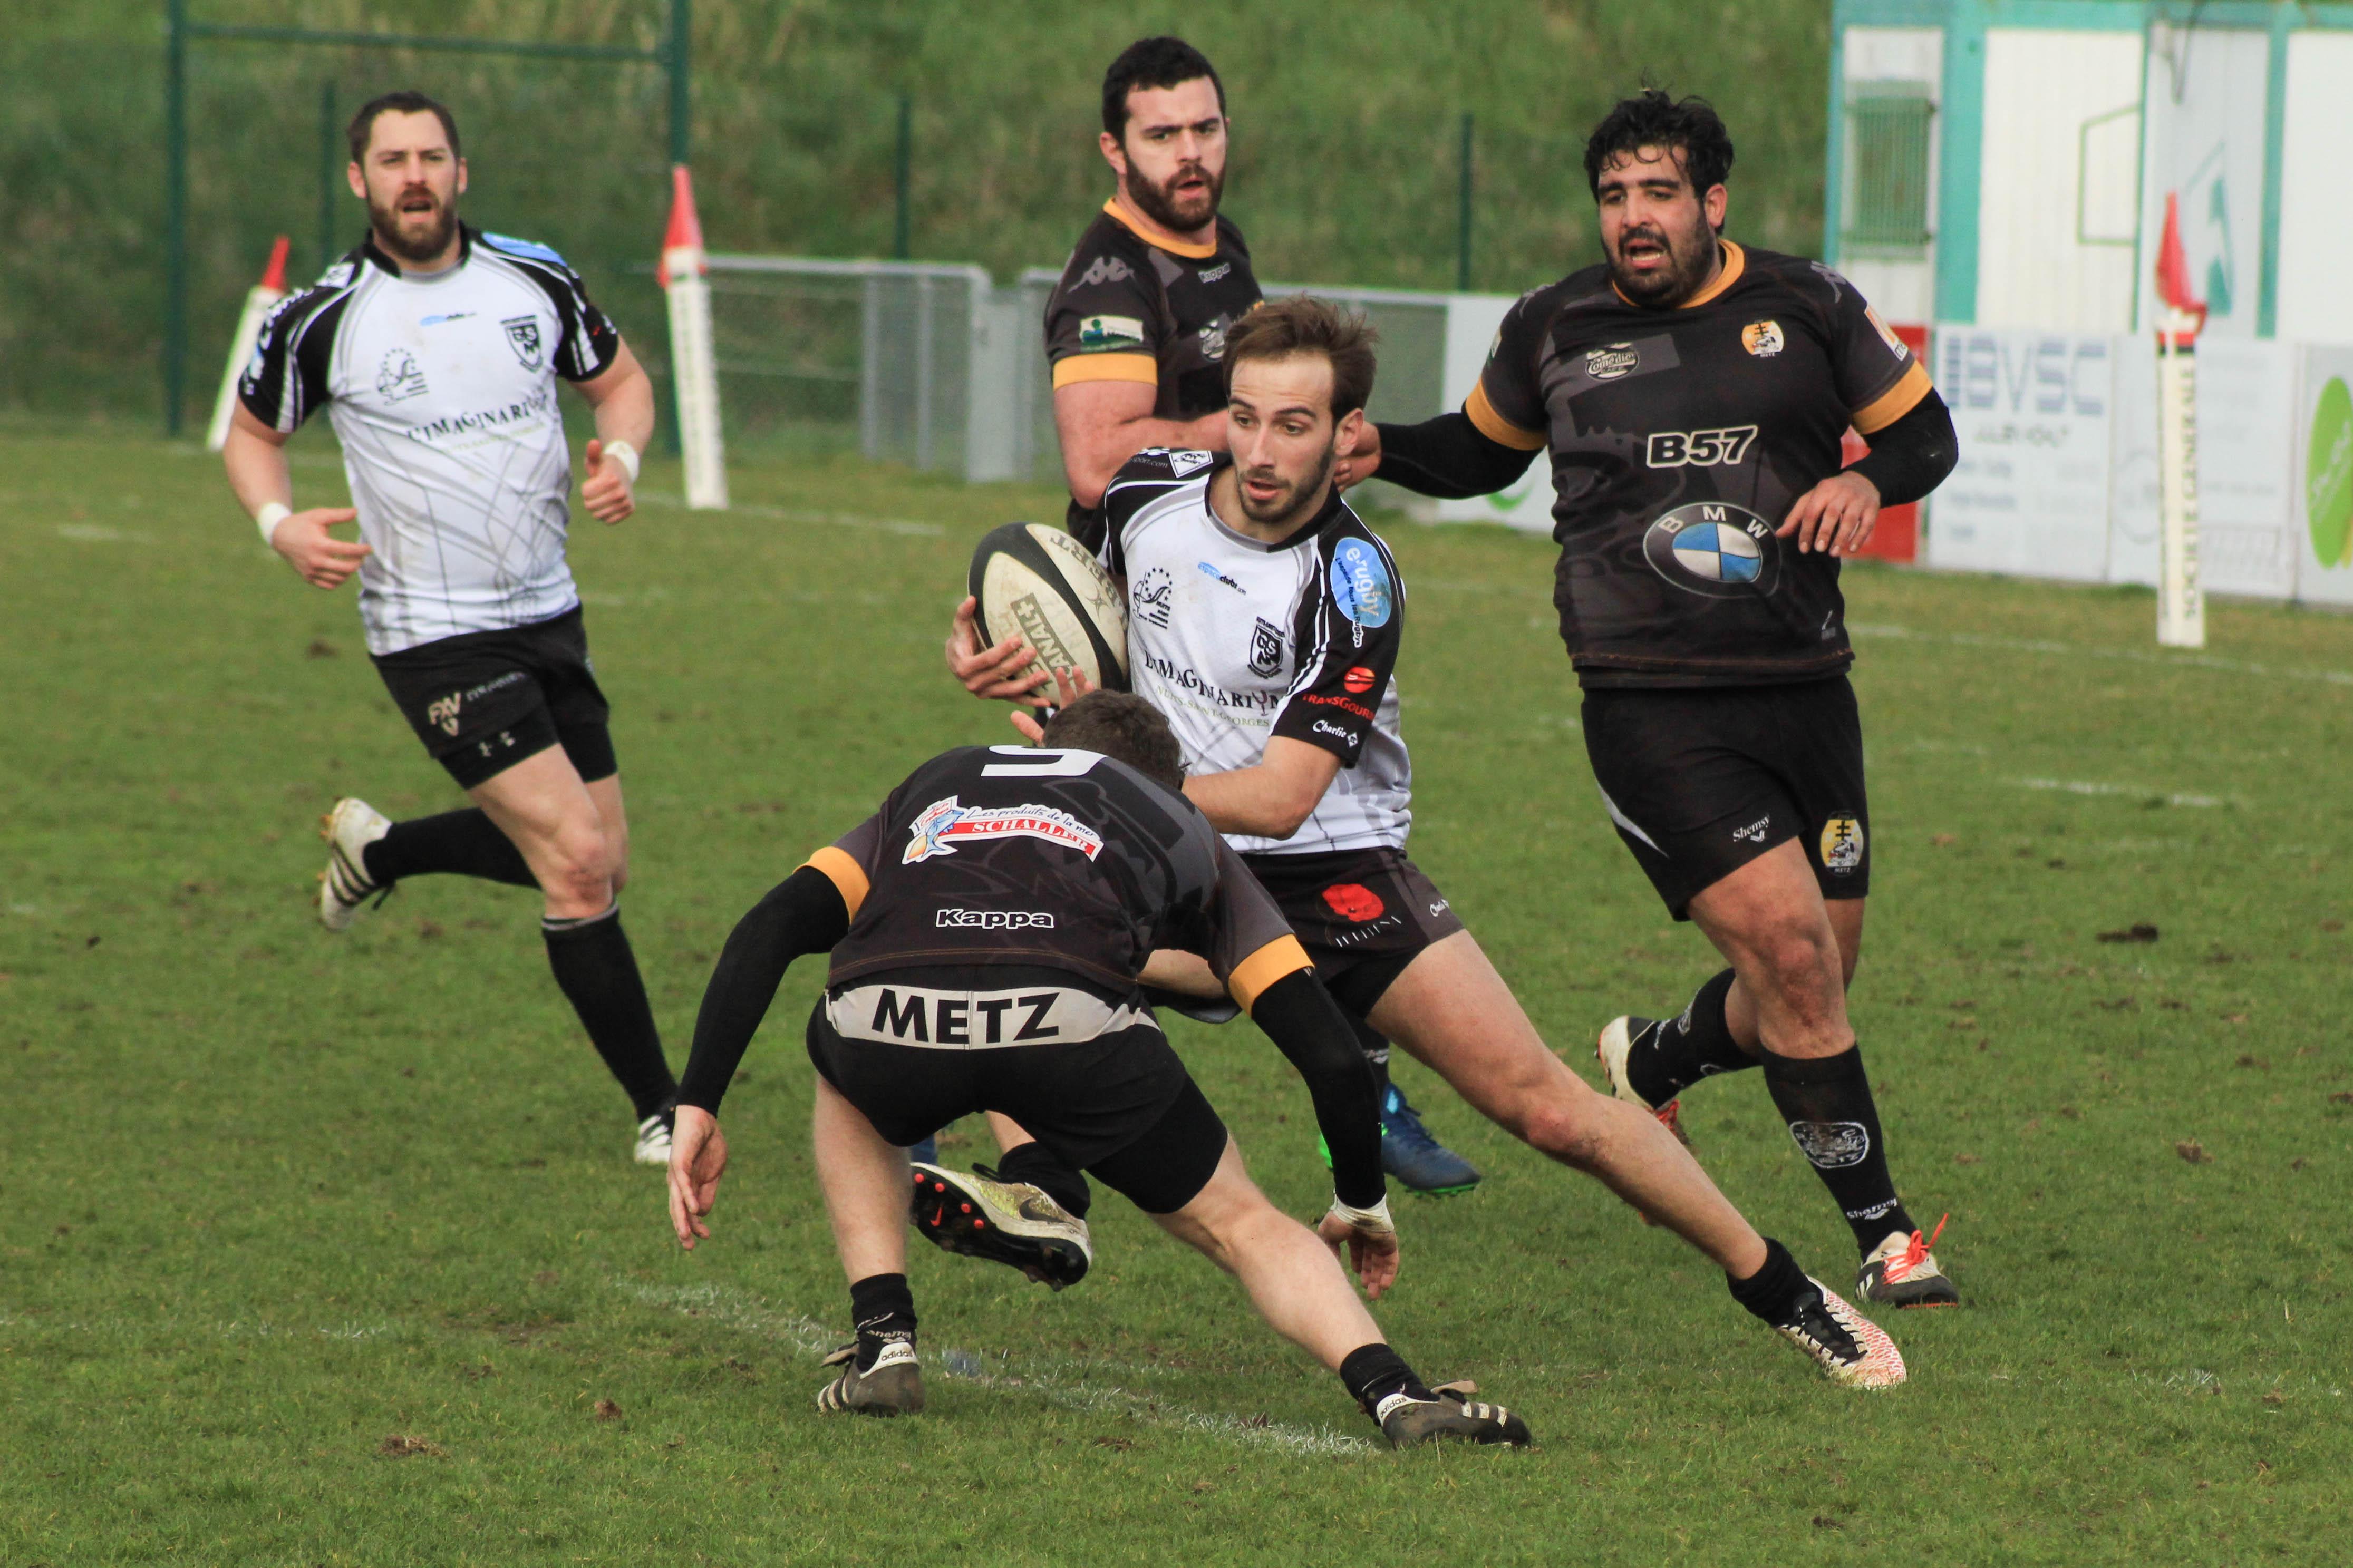 CSN Metz 19 03 17 (38)